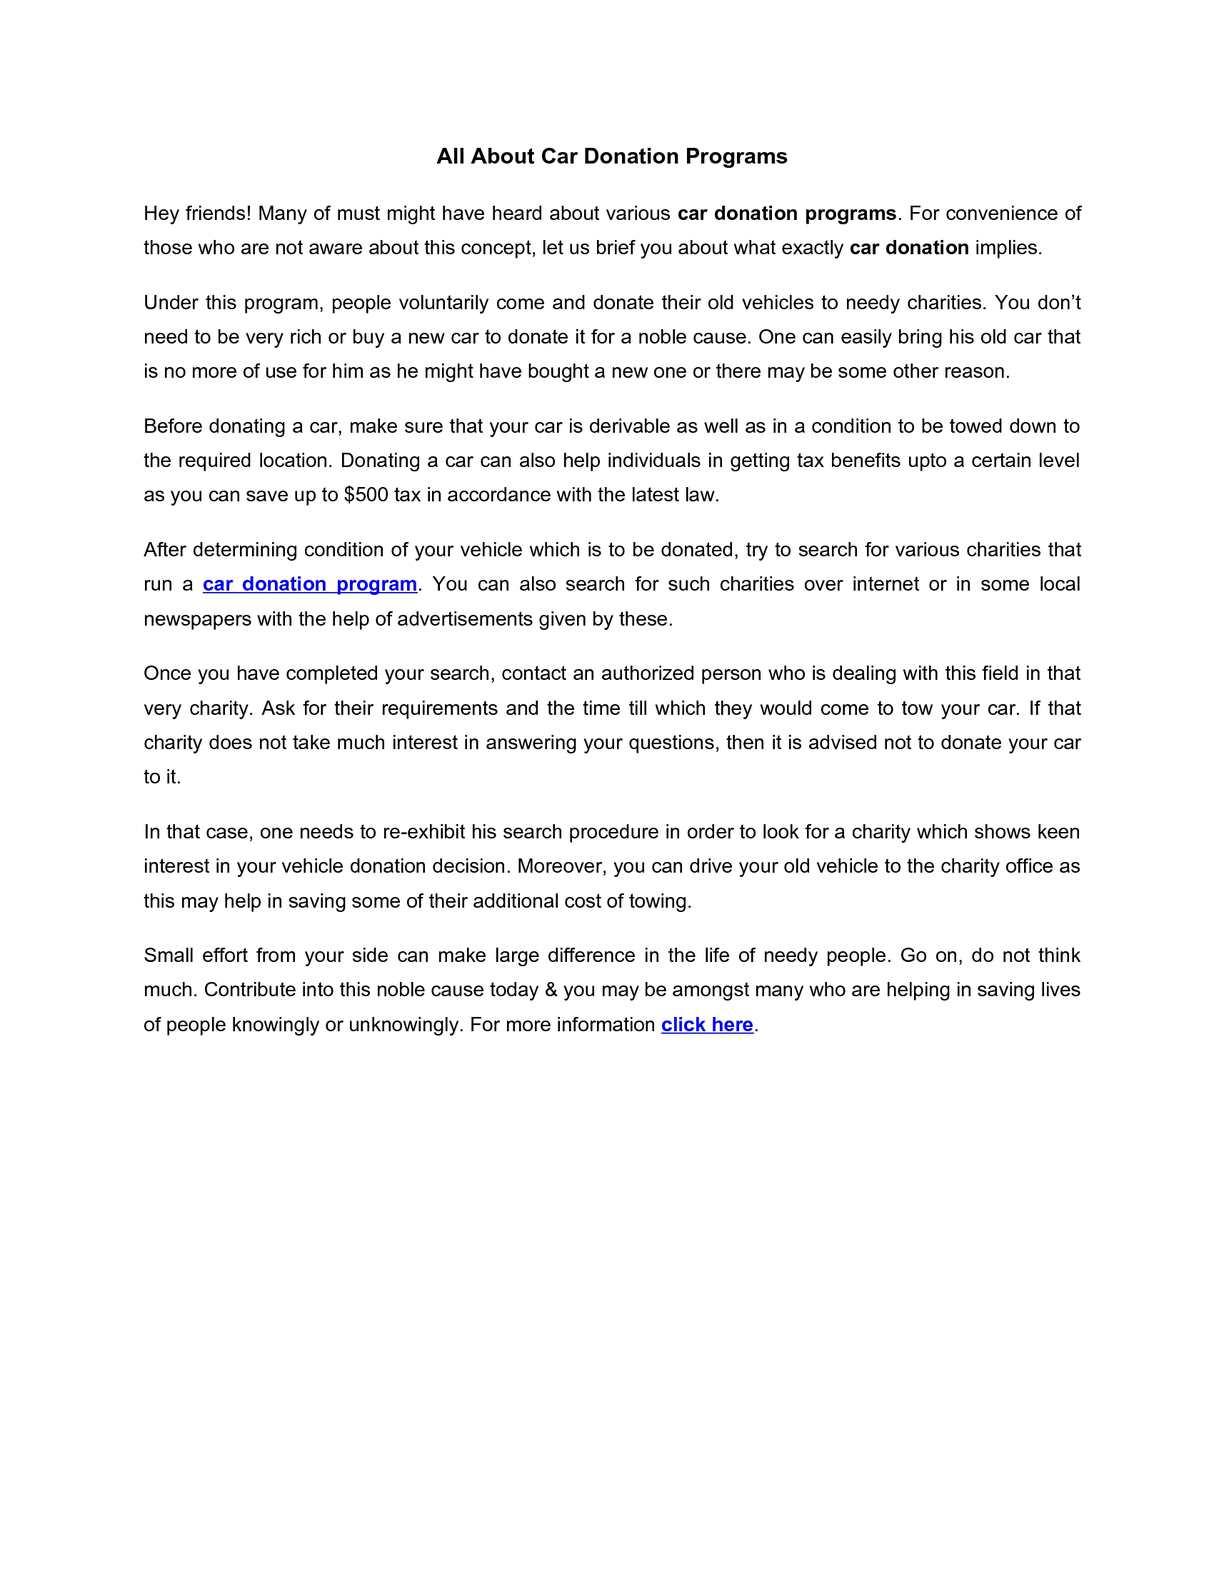 Calaméo - All About Car Donation Programs